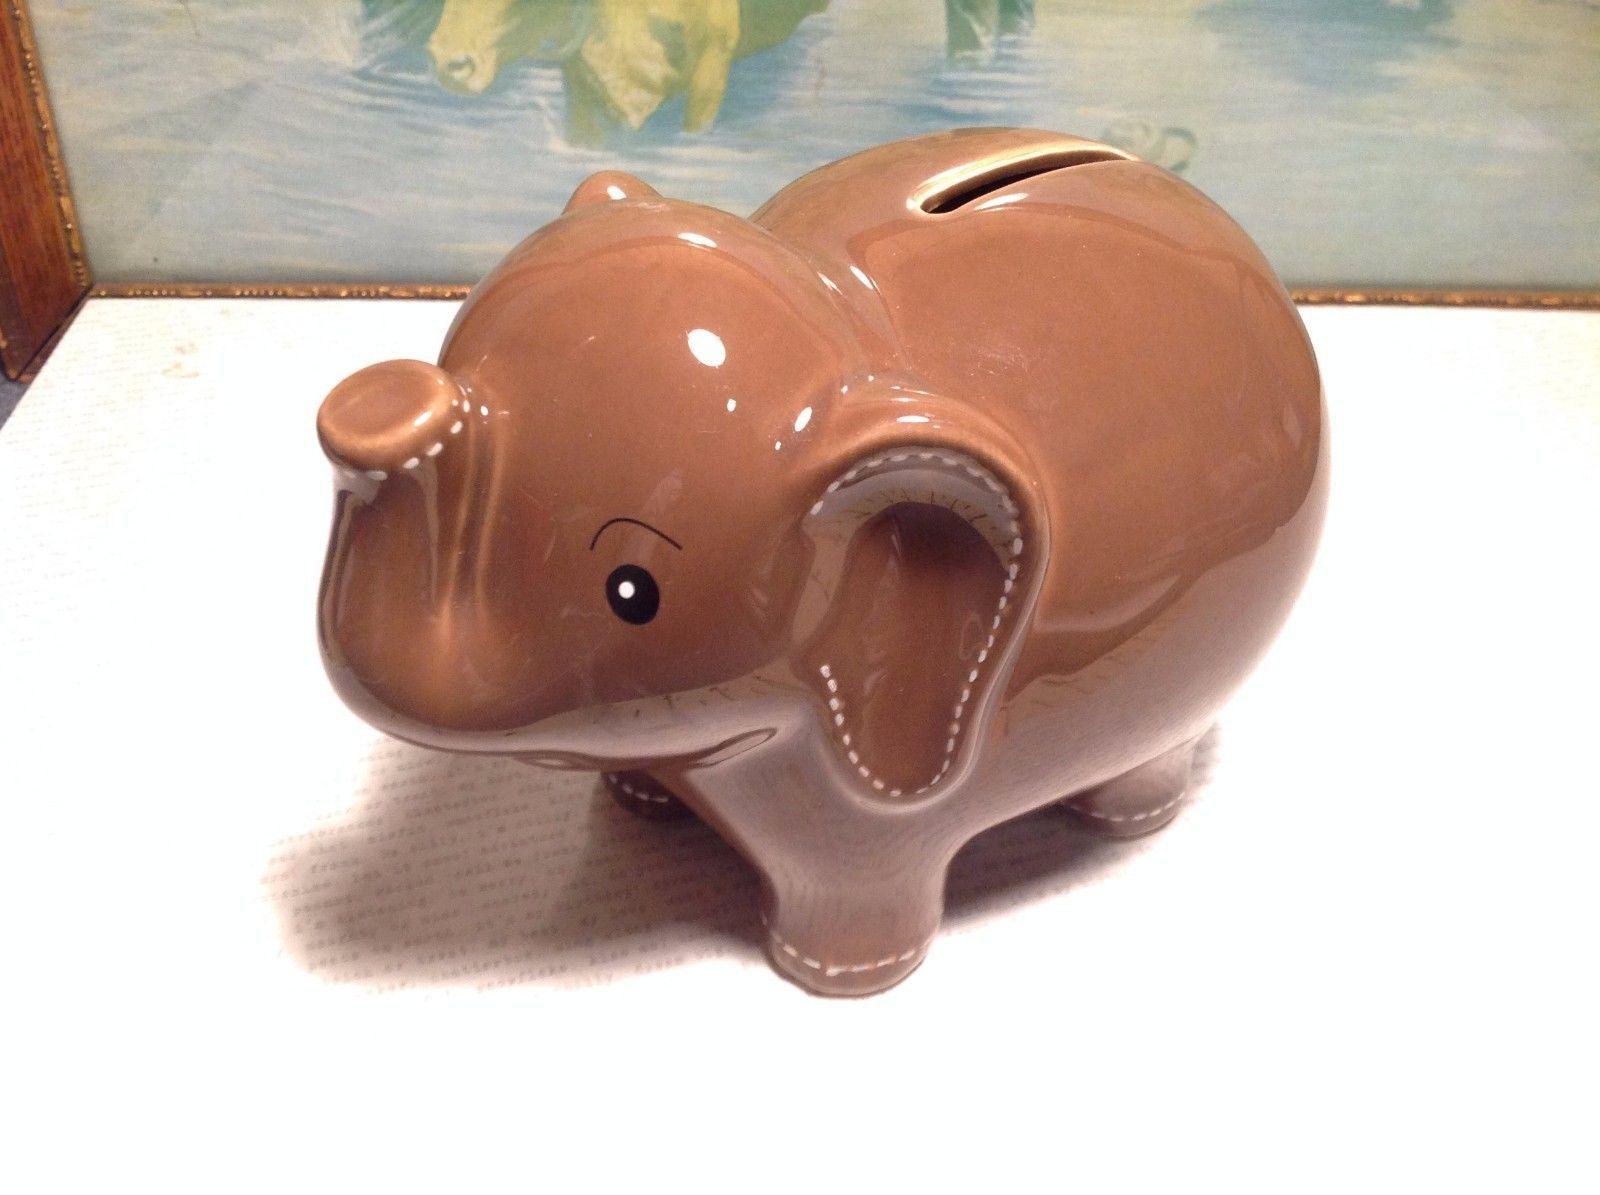 NEW Chocolate Brown Ceramic Elephant Piggy Bank